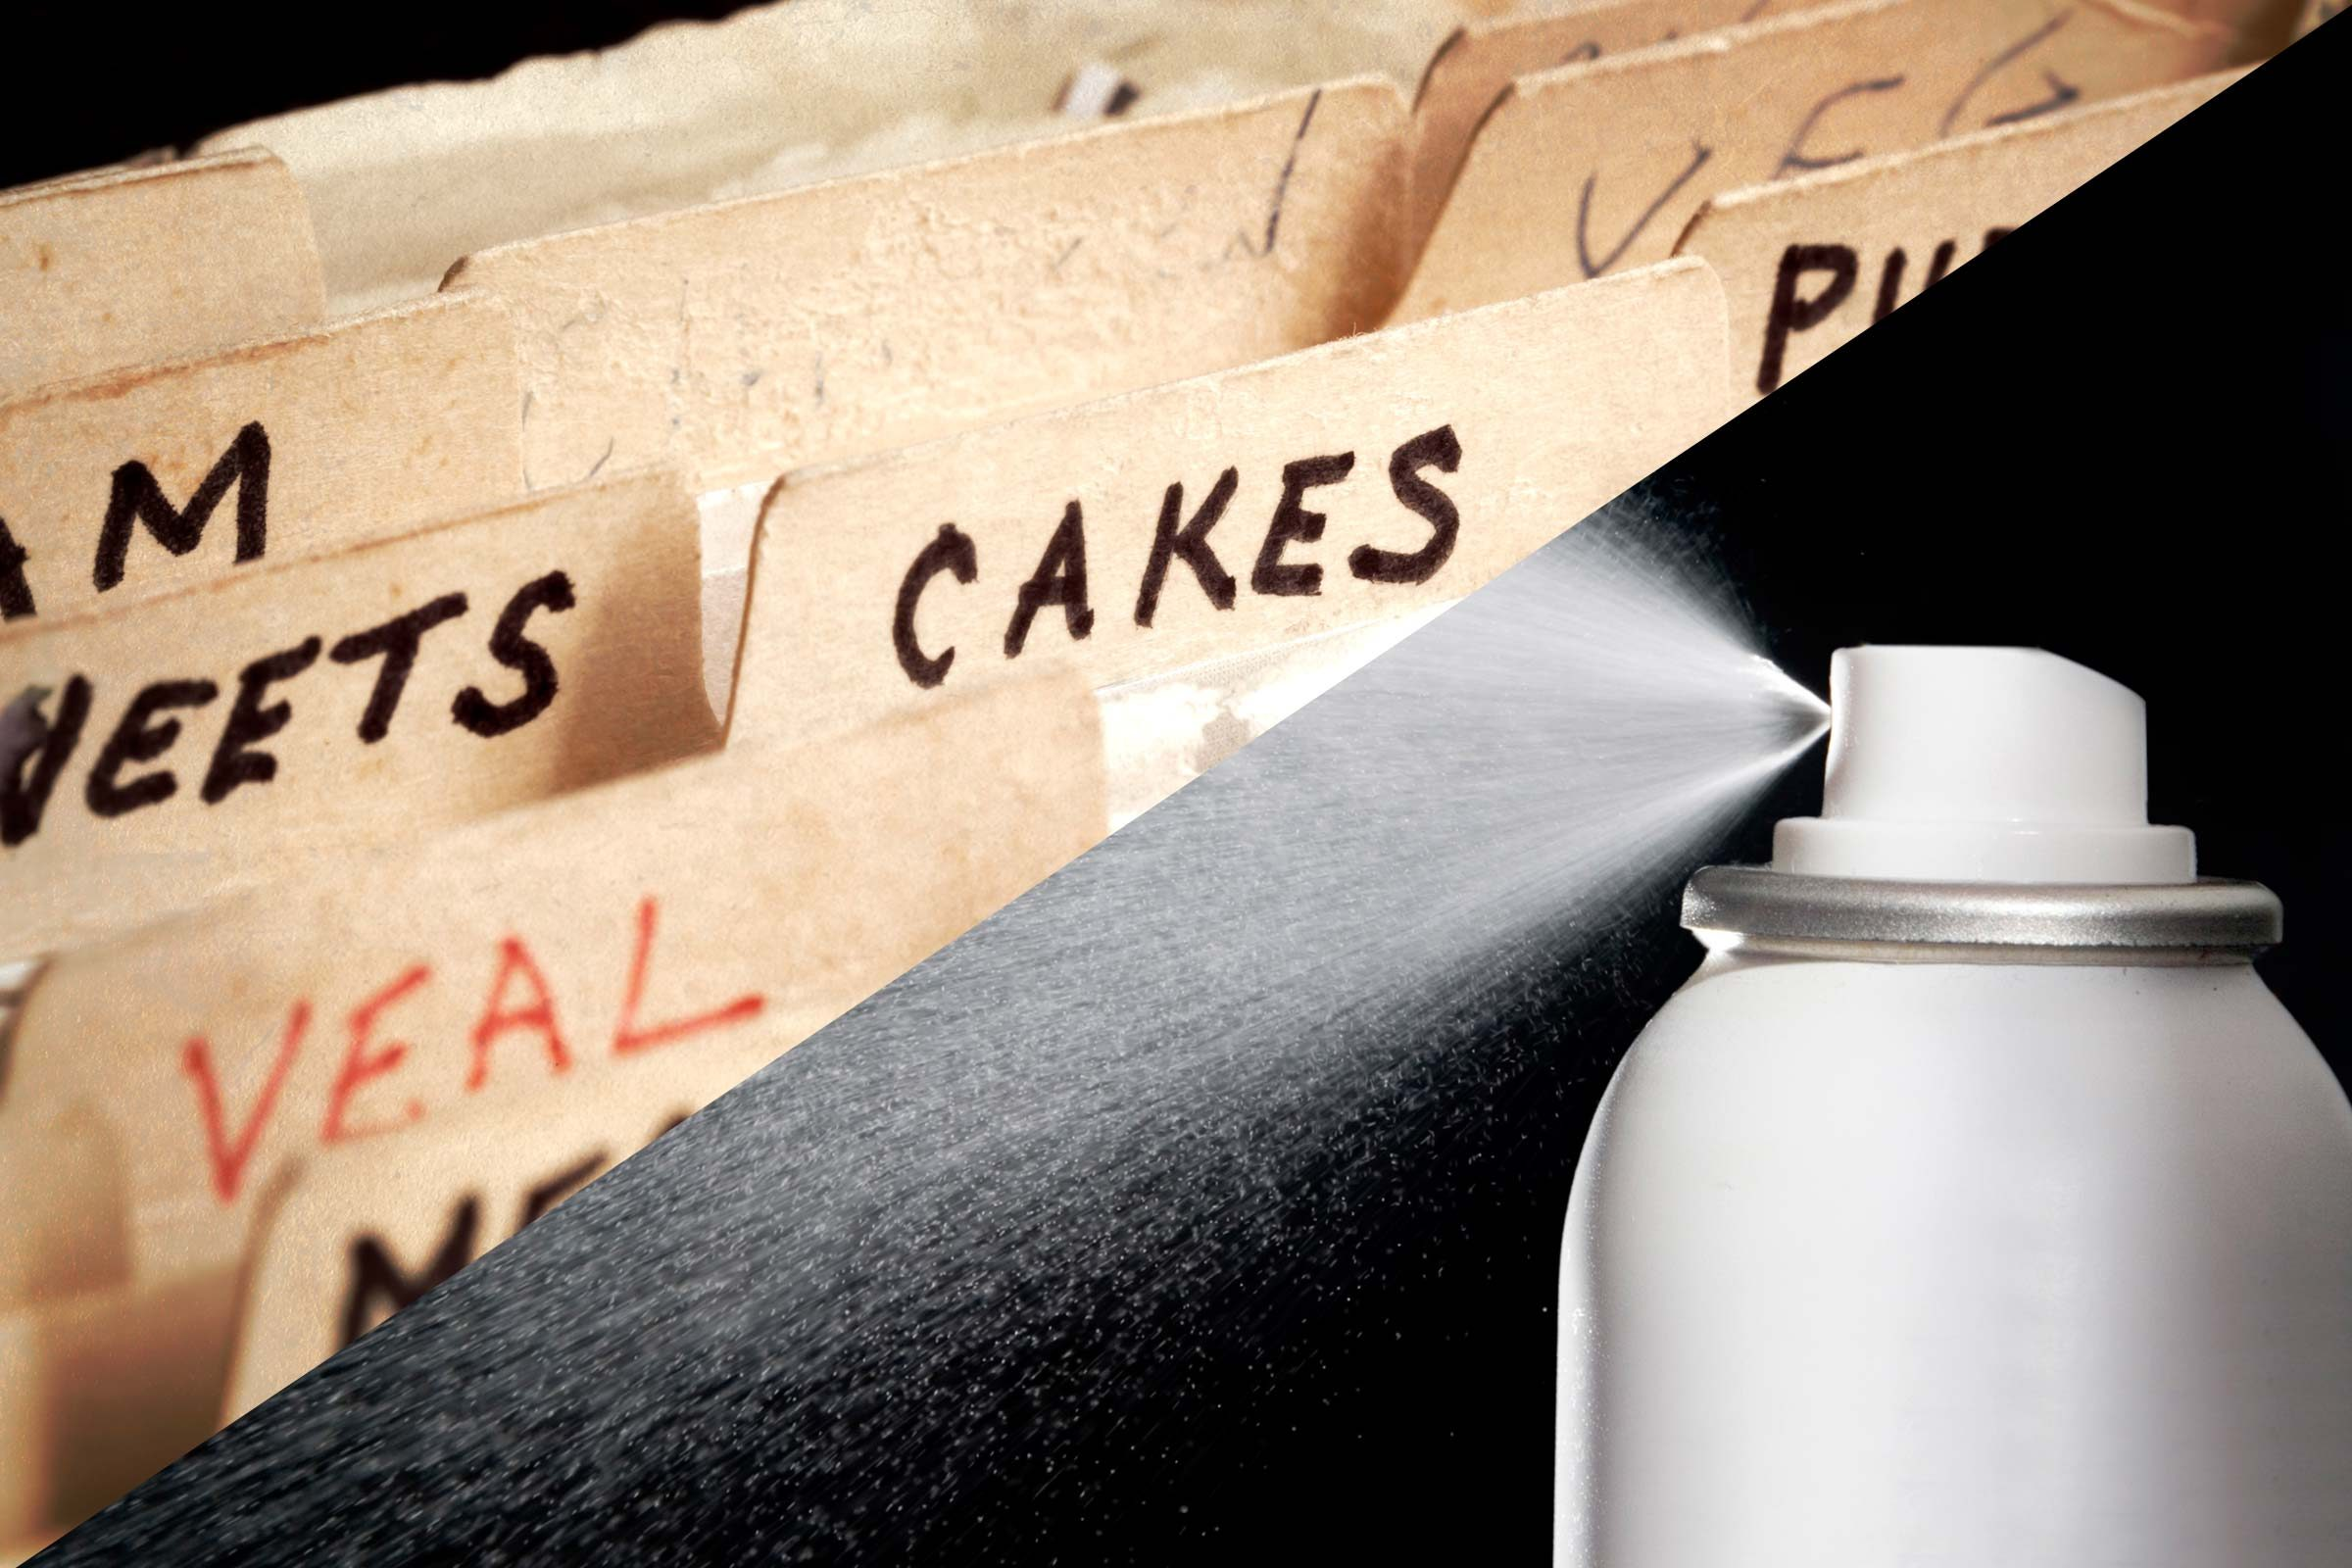 Keep recipe cards splatter-free